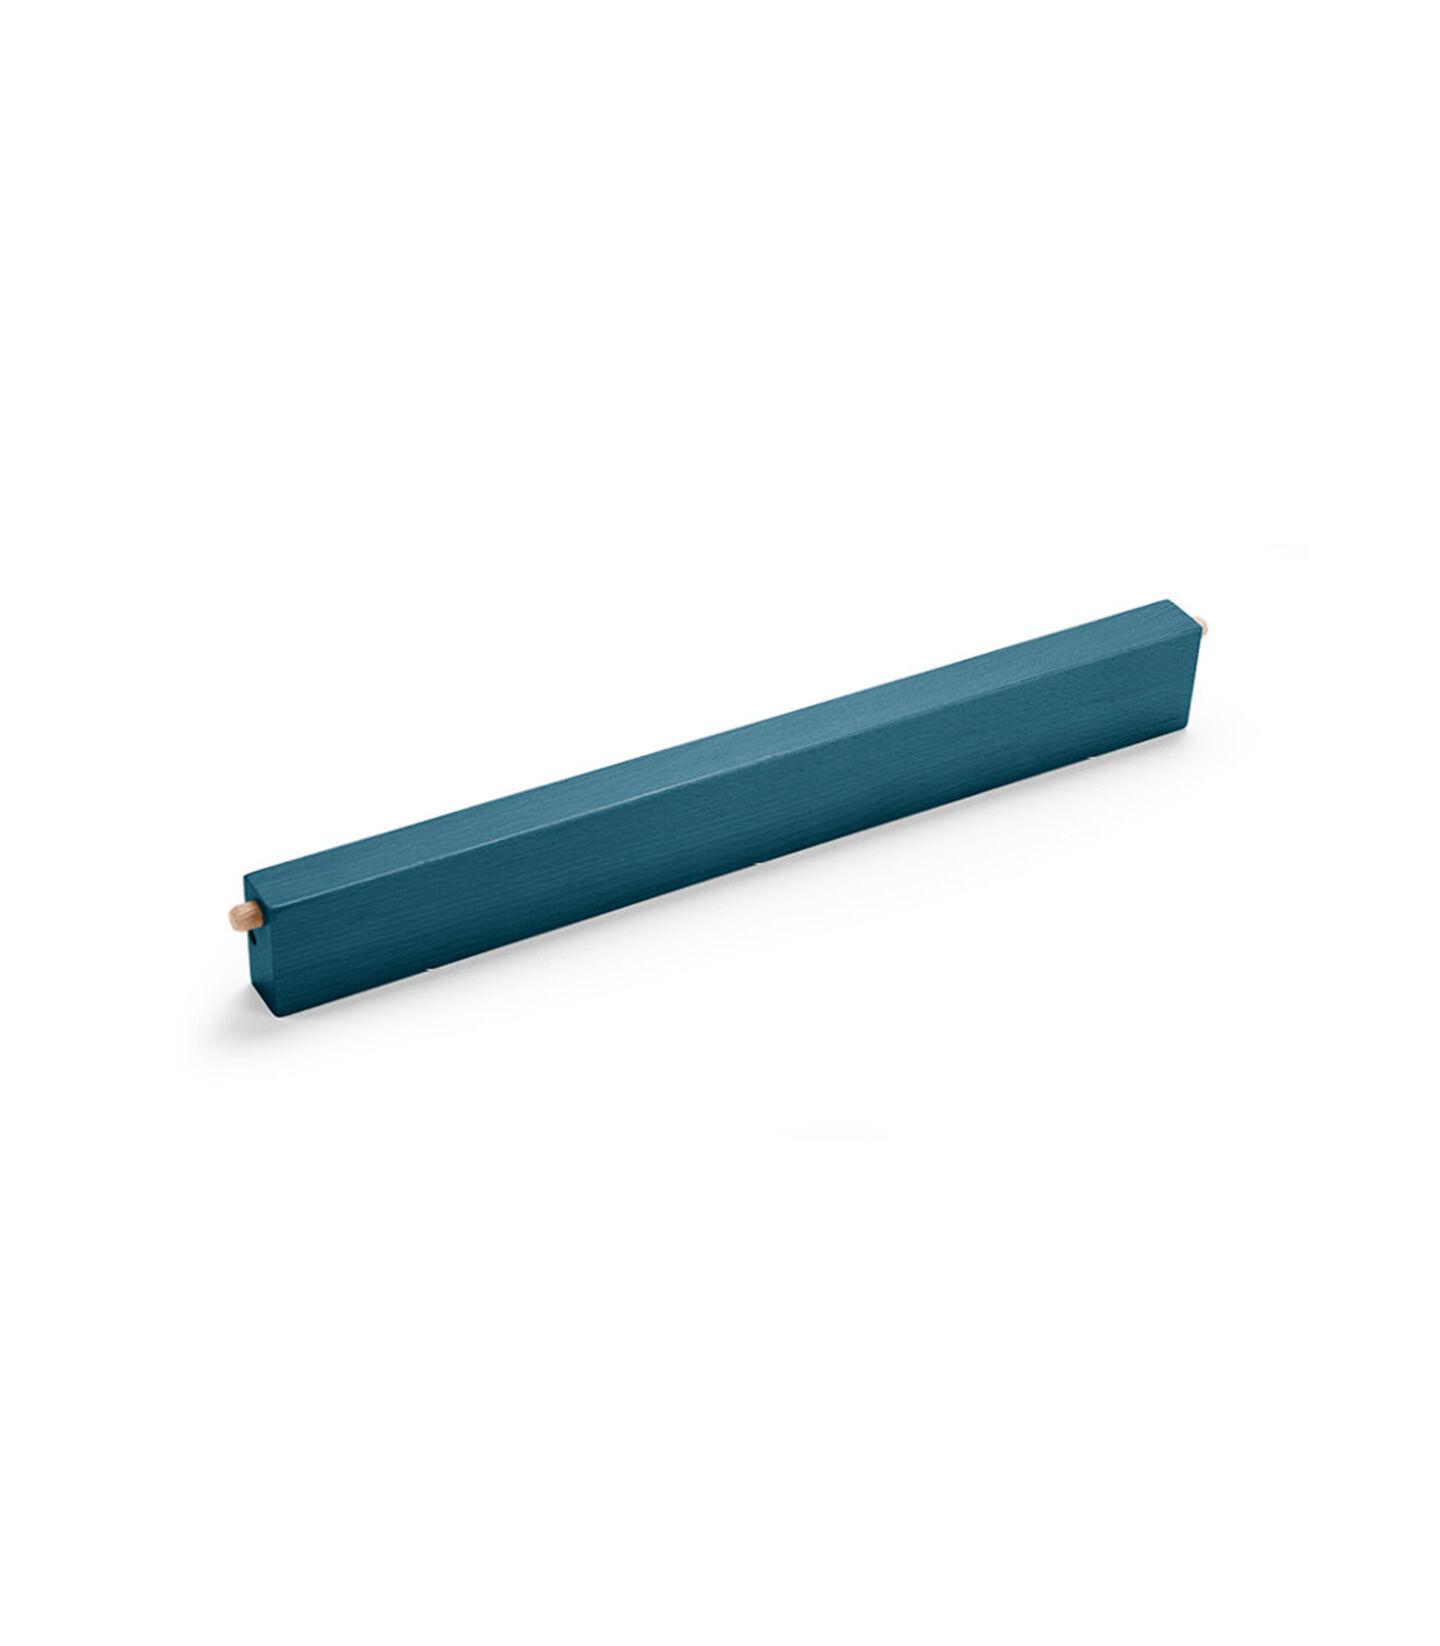 Tripp Trapp® Floorbrace Midnight Blue, Bleu nuit, mainview view 1